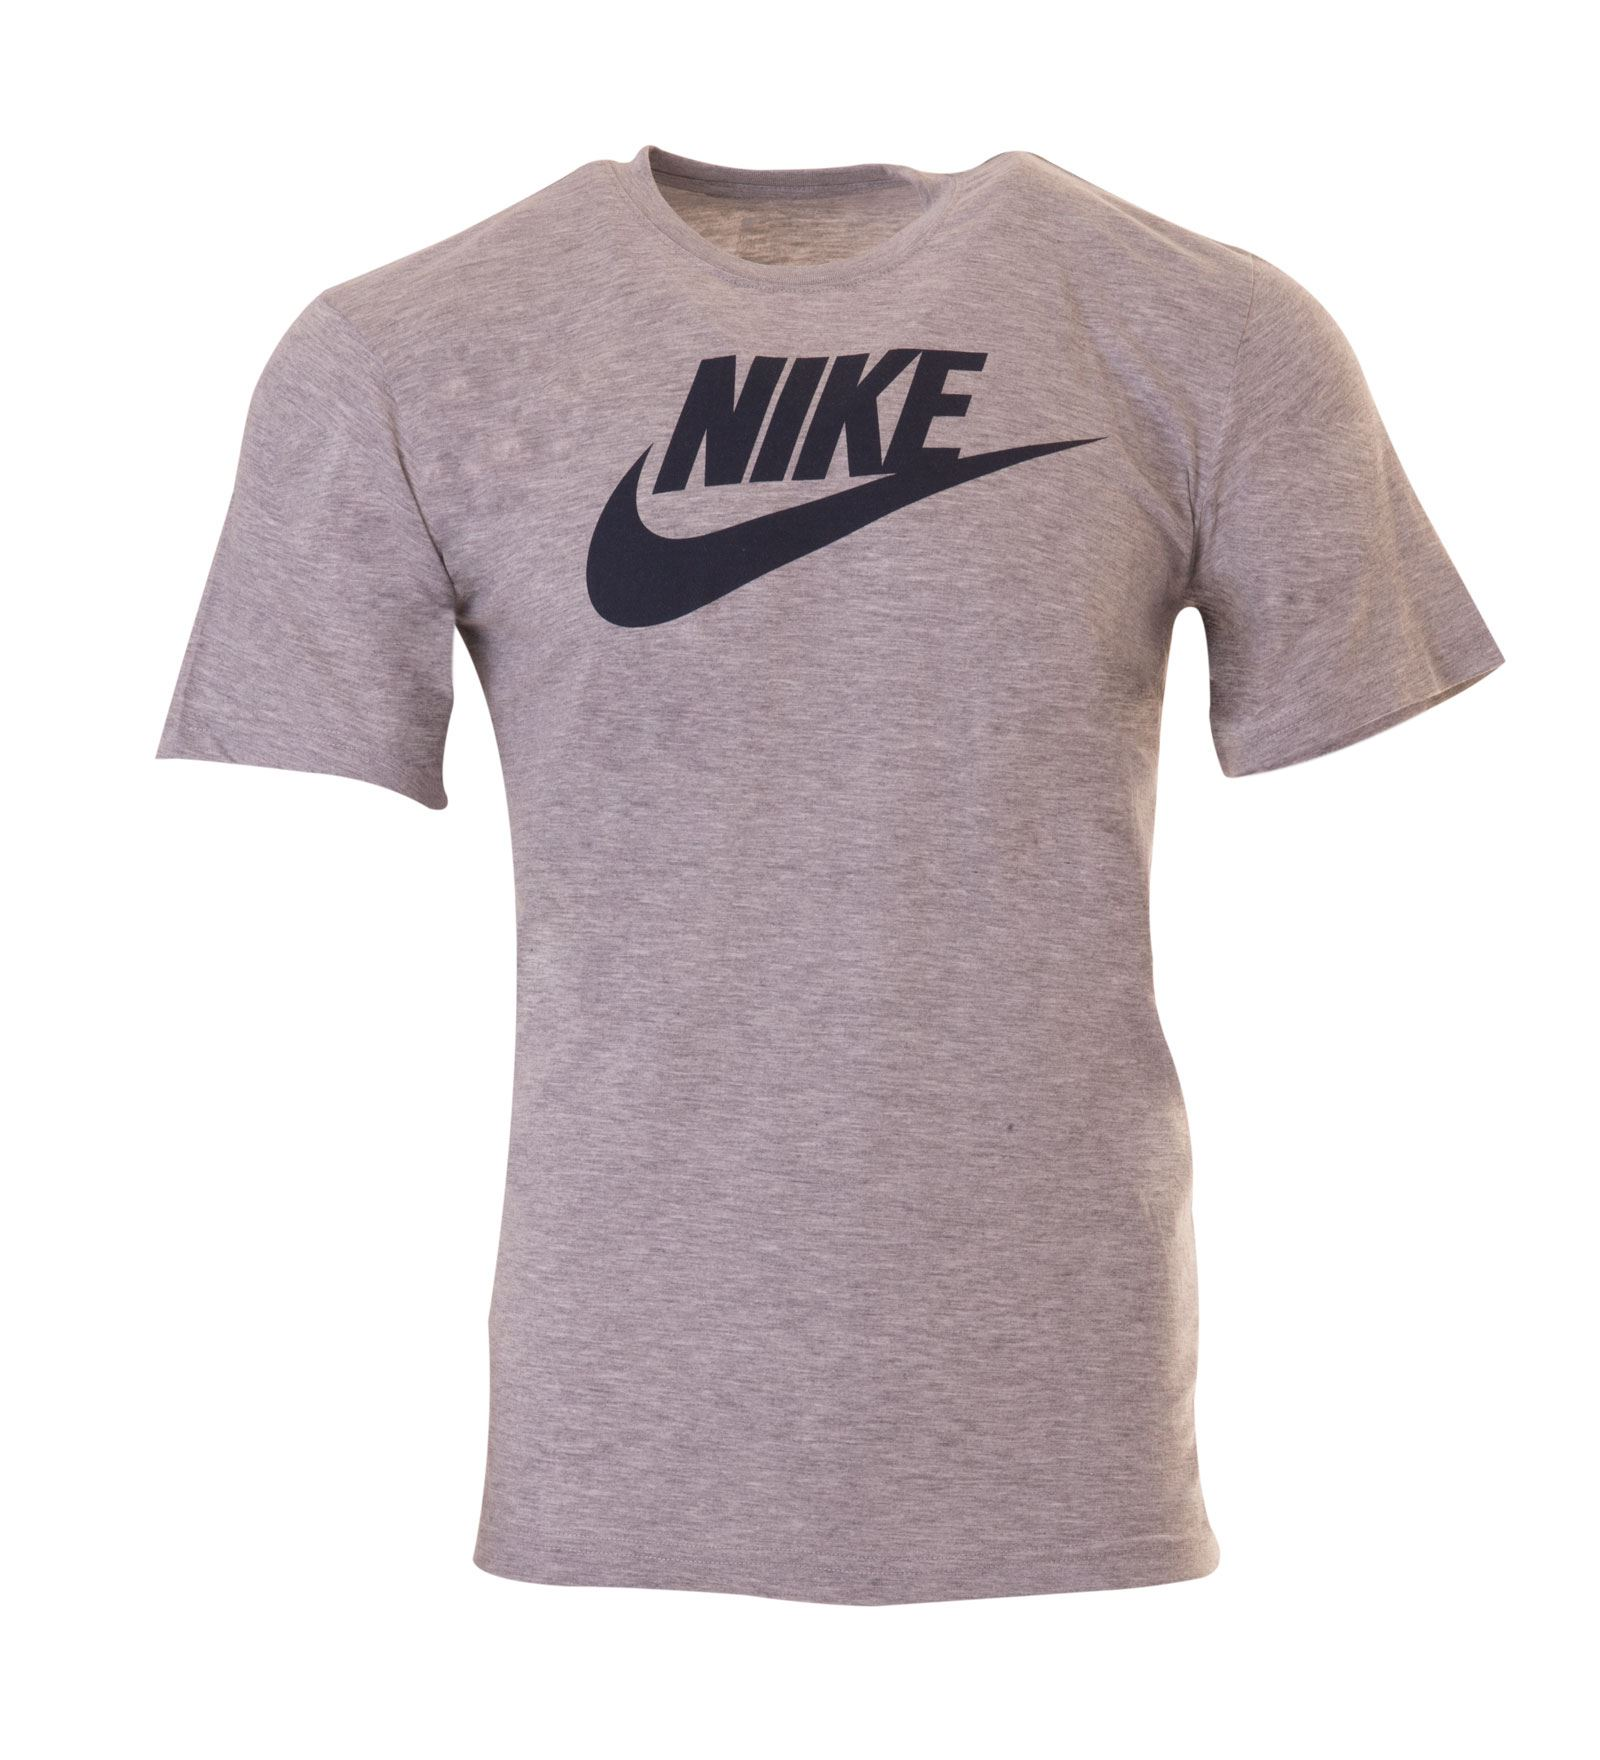 fb3448c9 Nike New Men's Tee-Futura Icon T-Shirts Lot BLACK,GREY & WHITE All Size's